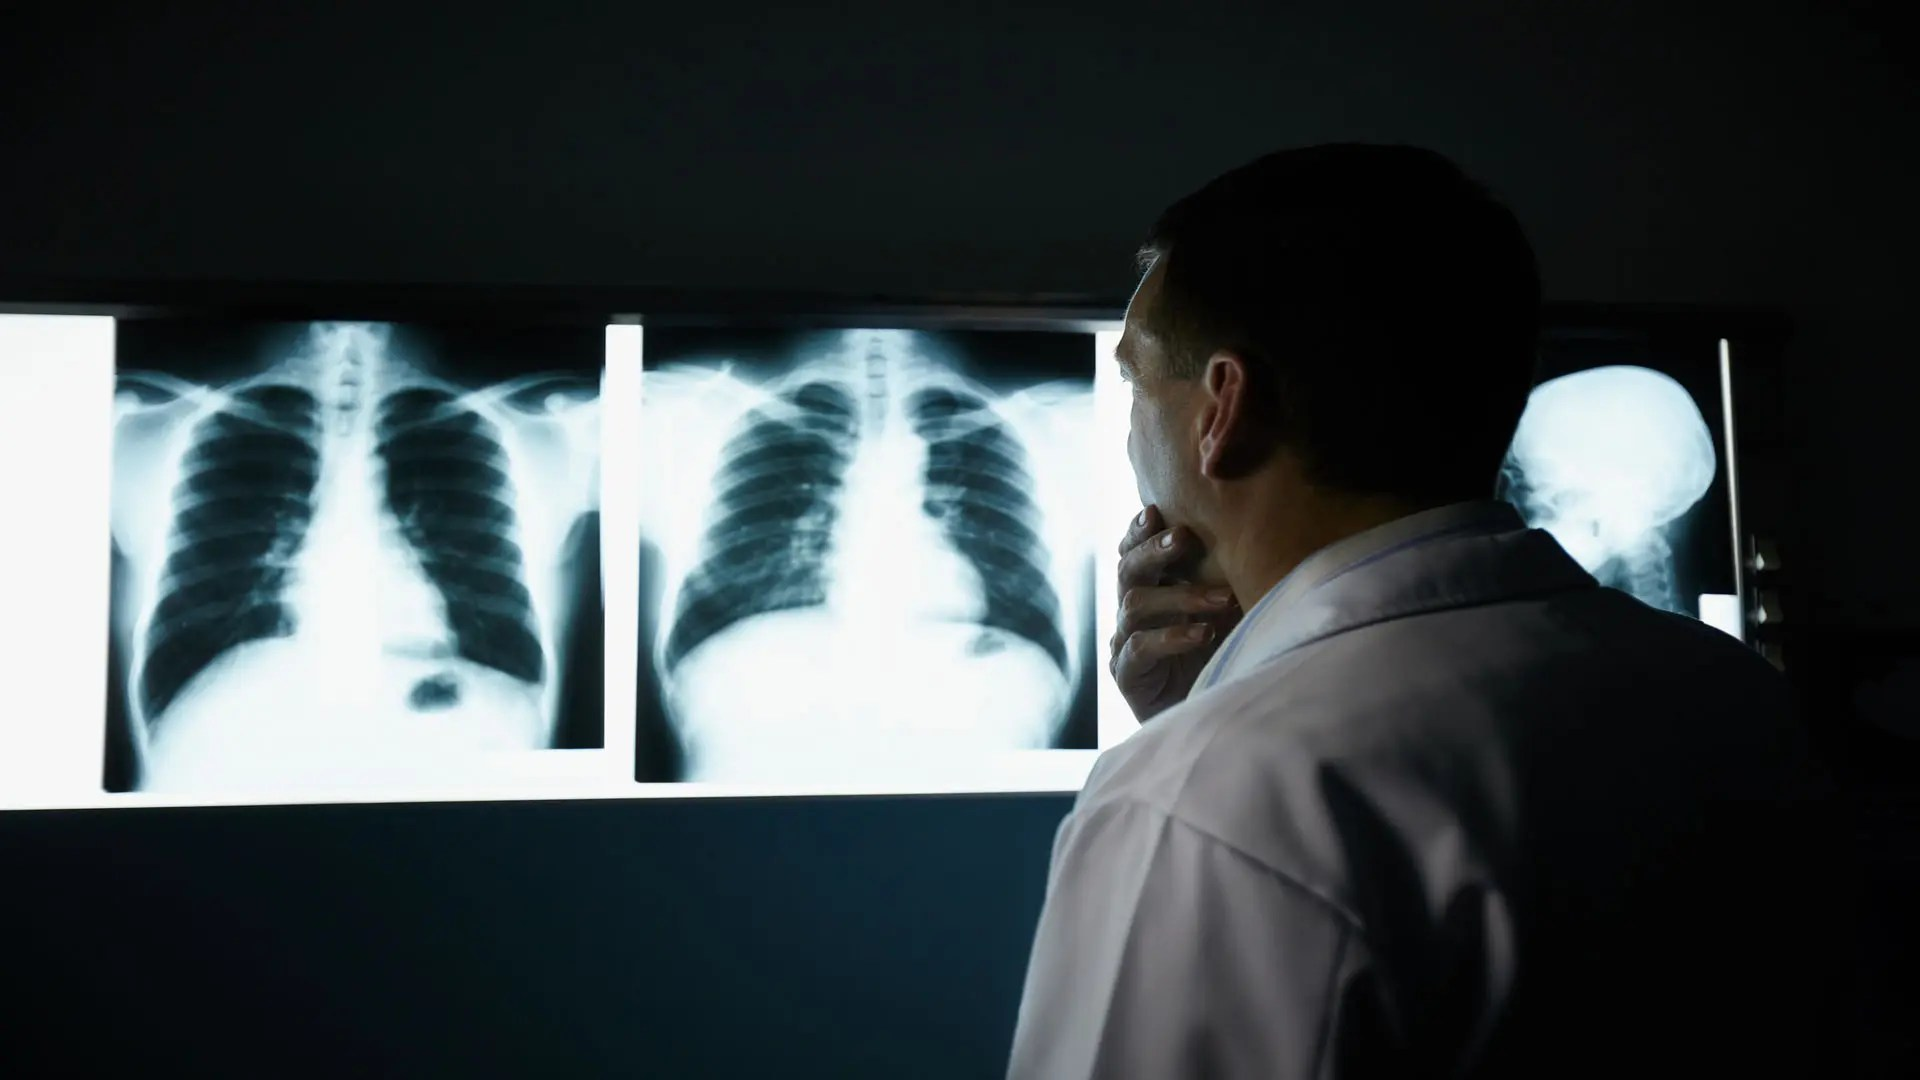 Calprotectina poate diagnostica cancerul